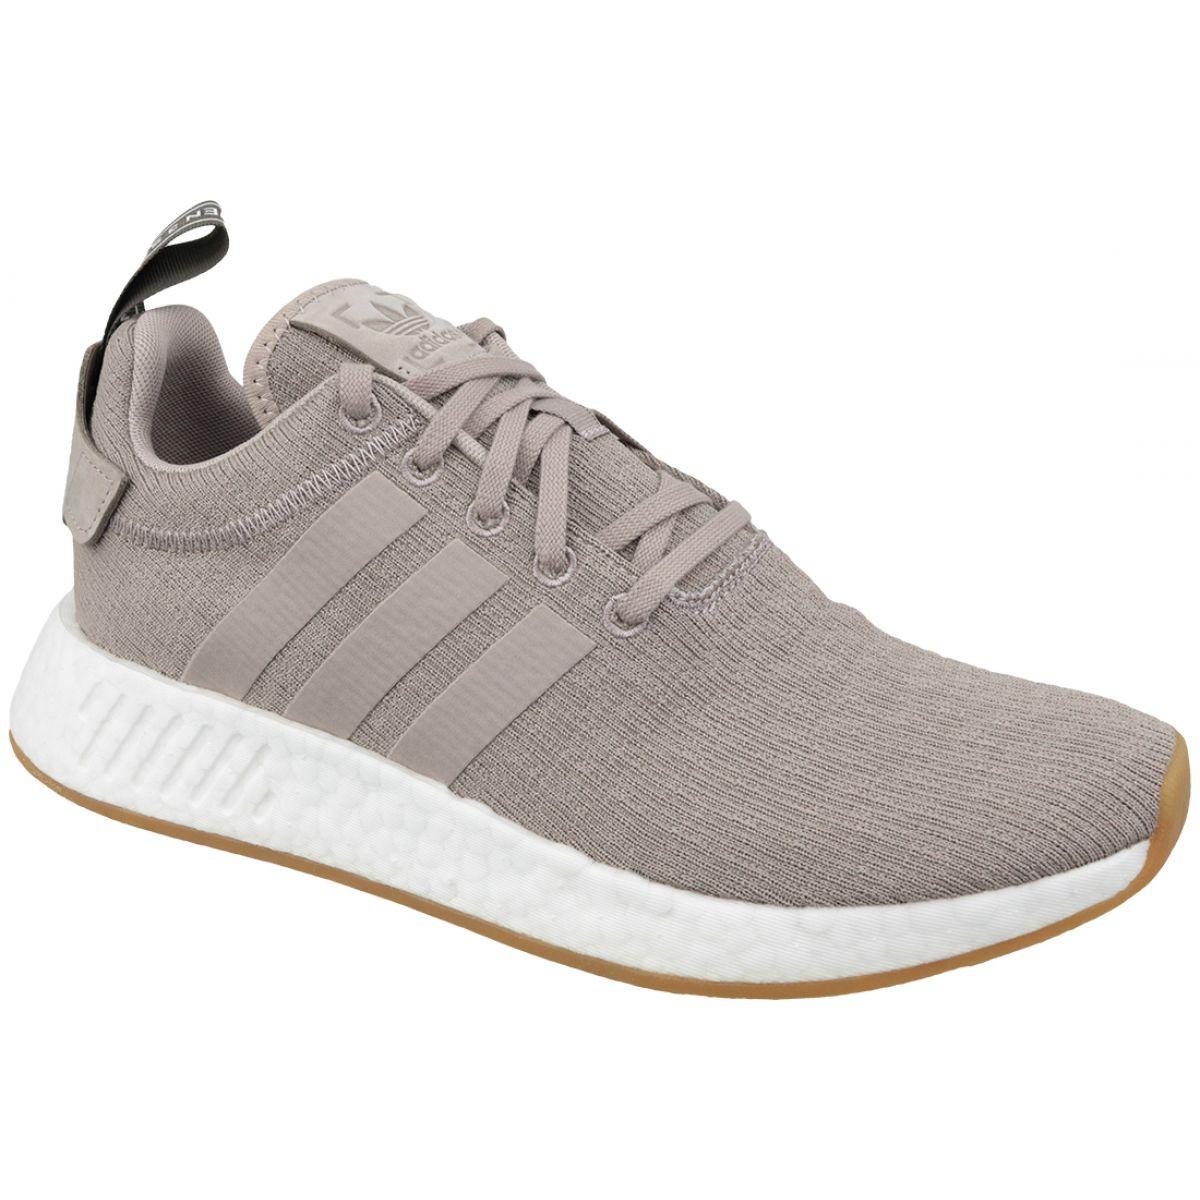 Adidas NMD_R2 M CQ2399 shoes grey